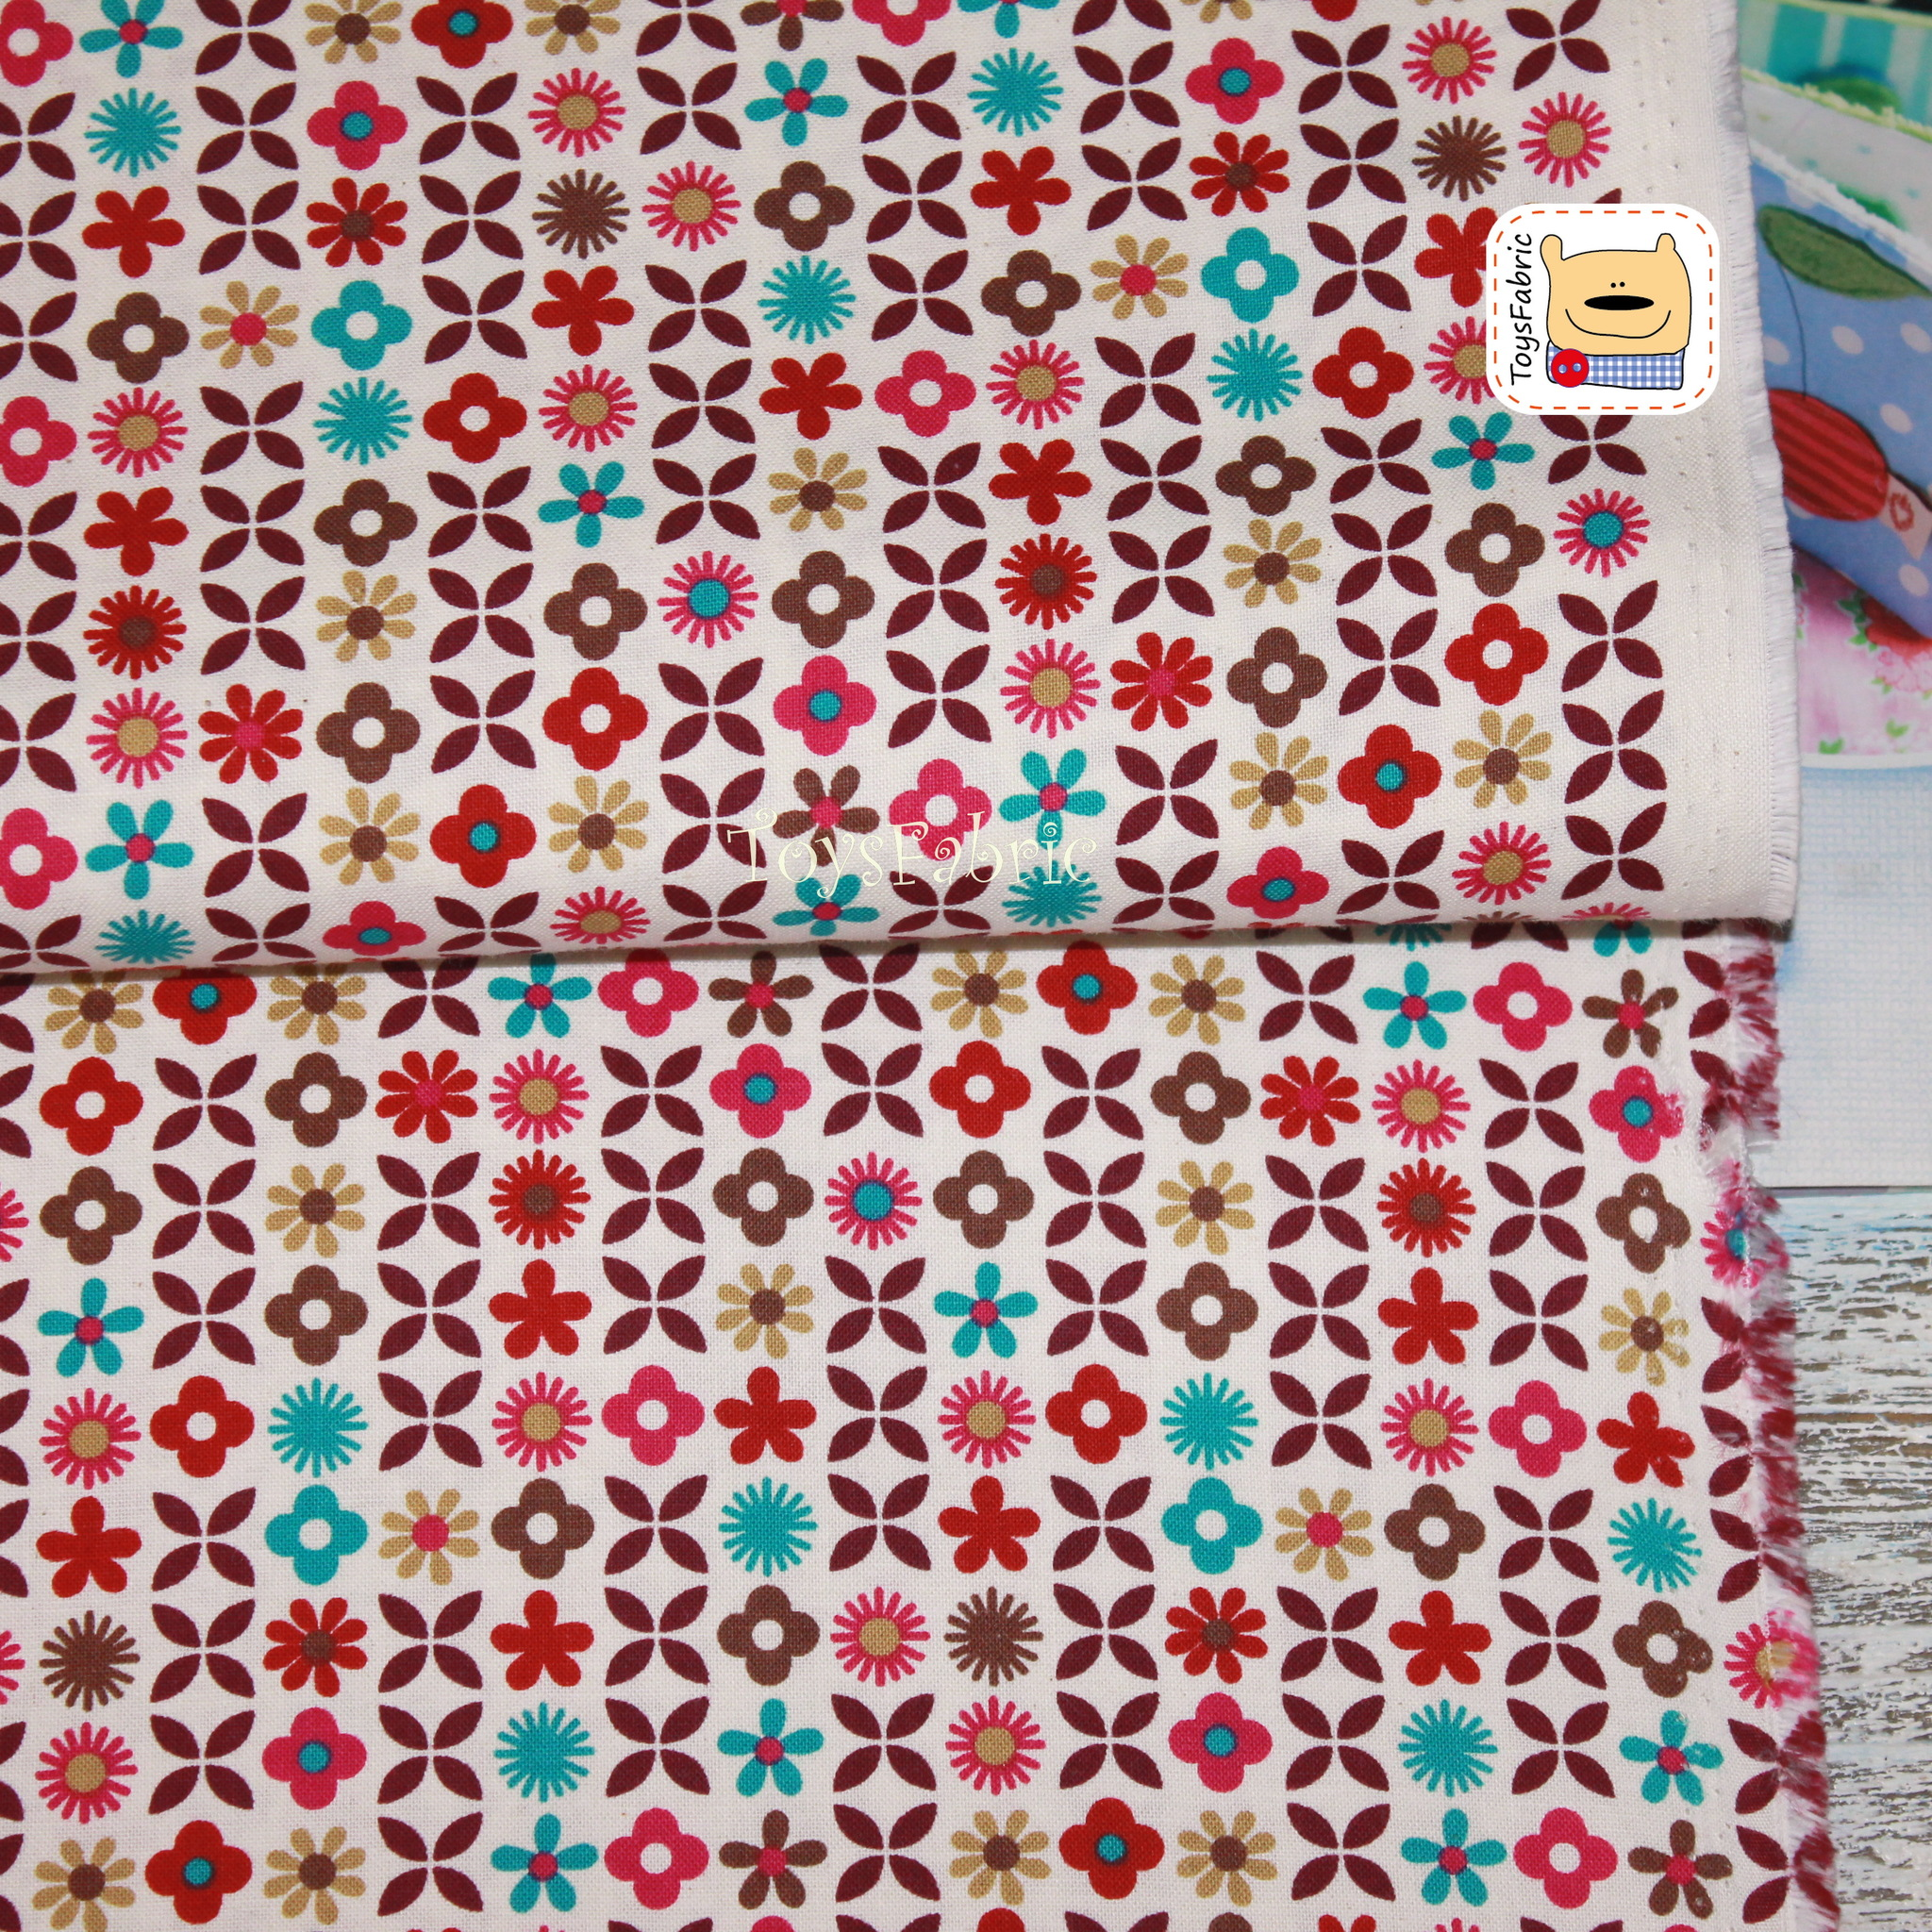 Ткань для пэчворка 20693 Цветочный орнамент (45х55см)